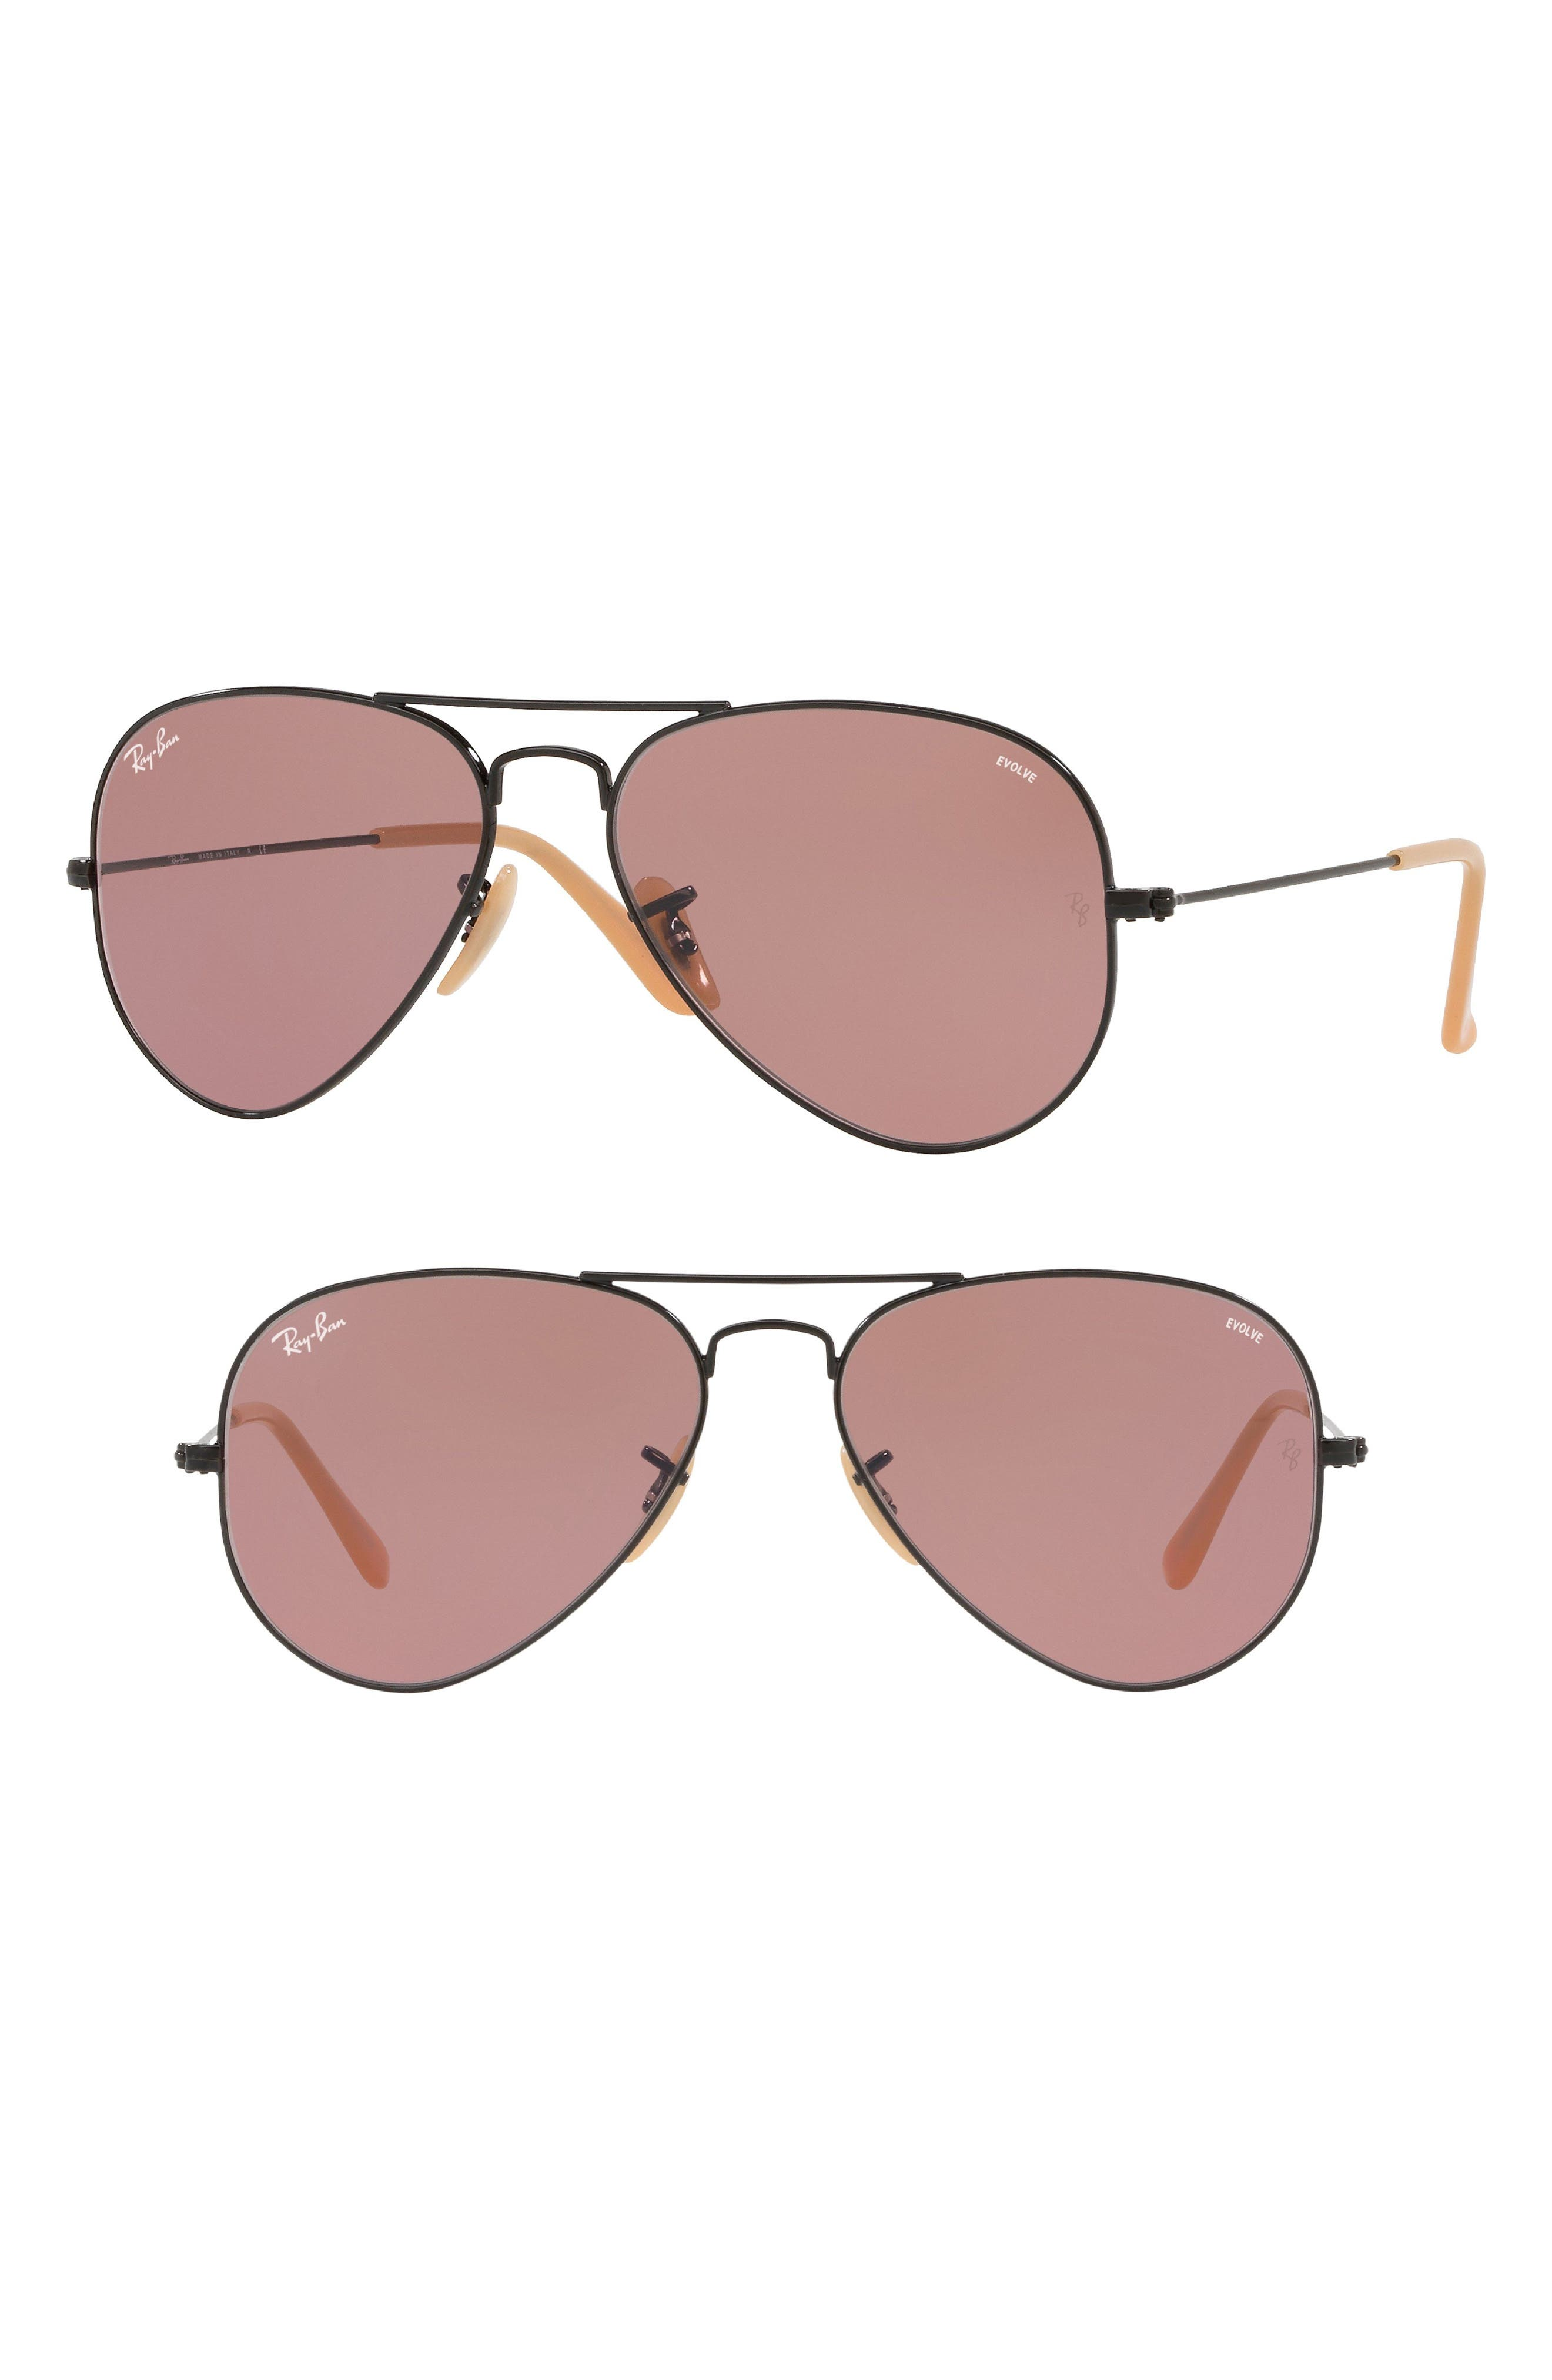 58mm Evolve Photochromic Aviator Sunglasses,                         Main,                         color, 001